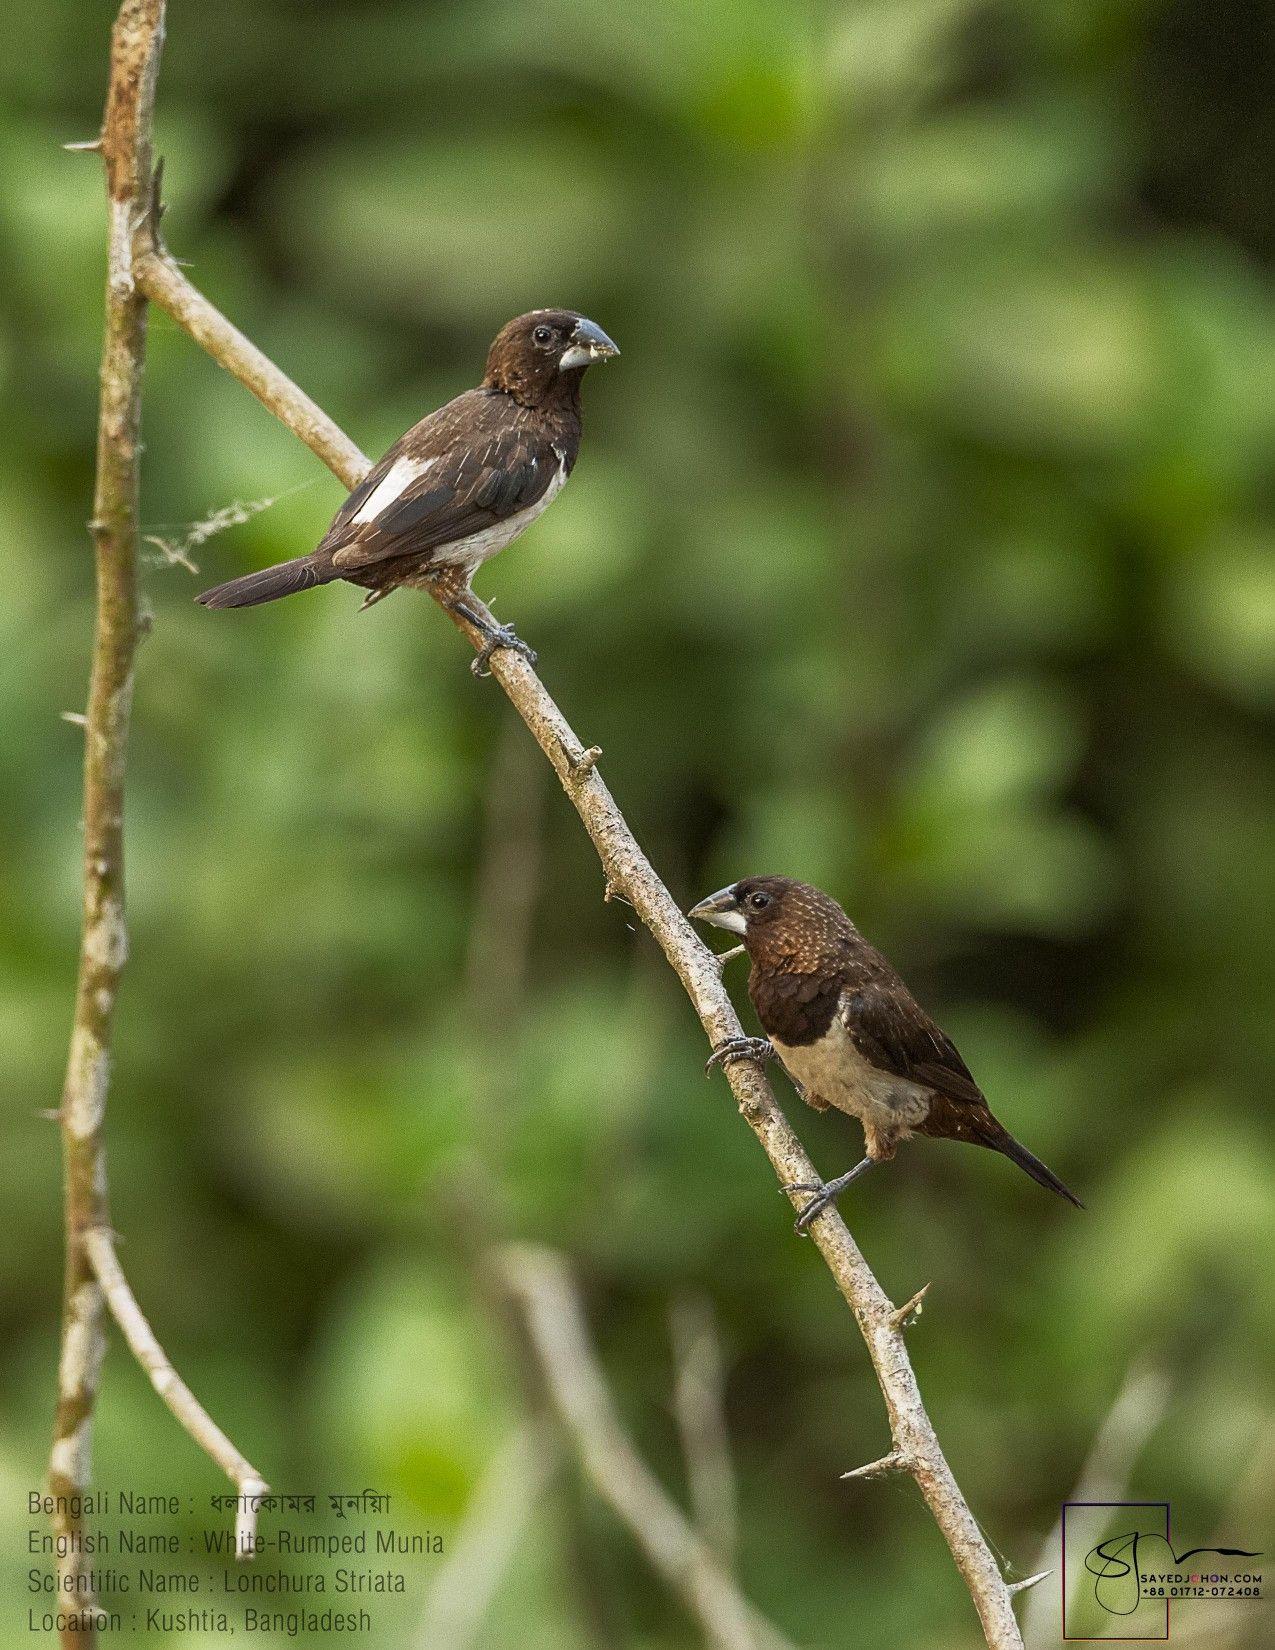 #wildlife #wildlifephotography #birds #picusxanthopygaeus #birdrules #birds_adored #BIRDS_iLLife #naturist #best_birds_planet #your_best_birds #natureinfocus #EarthCapture #YourShotPhotographer #earthpix #naturephotography #naturelovers #picoftheday #daulatpur #kushtia @best_birds_of_world #best_birds_of_world @BBCErth #bangladesh #birdsofbangladesh #outdoors #sayedjohon #sayedjohonPhotography #wildlifebangladesh